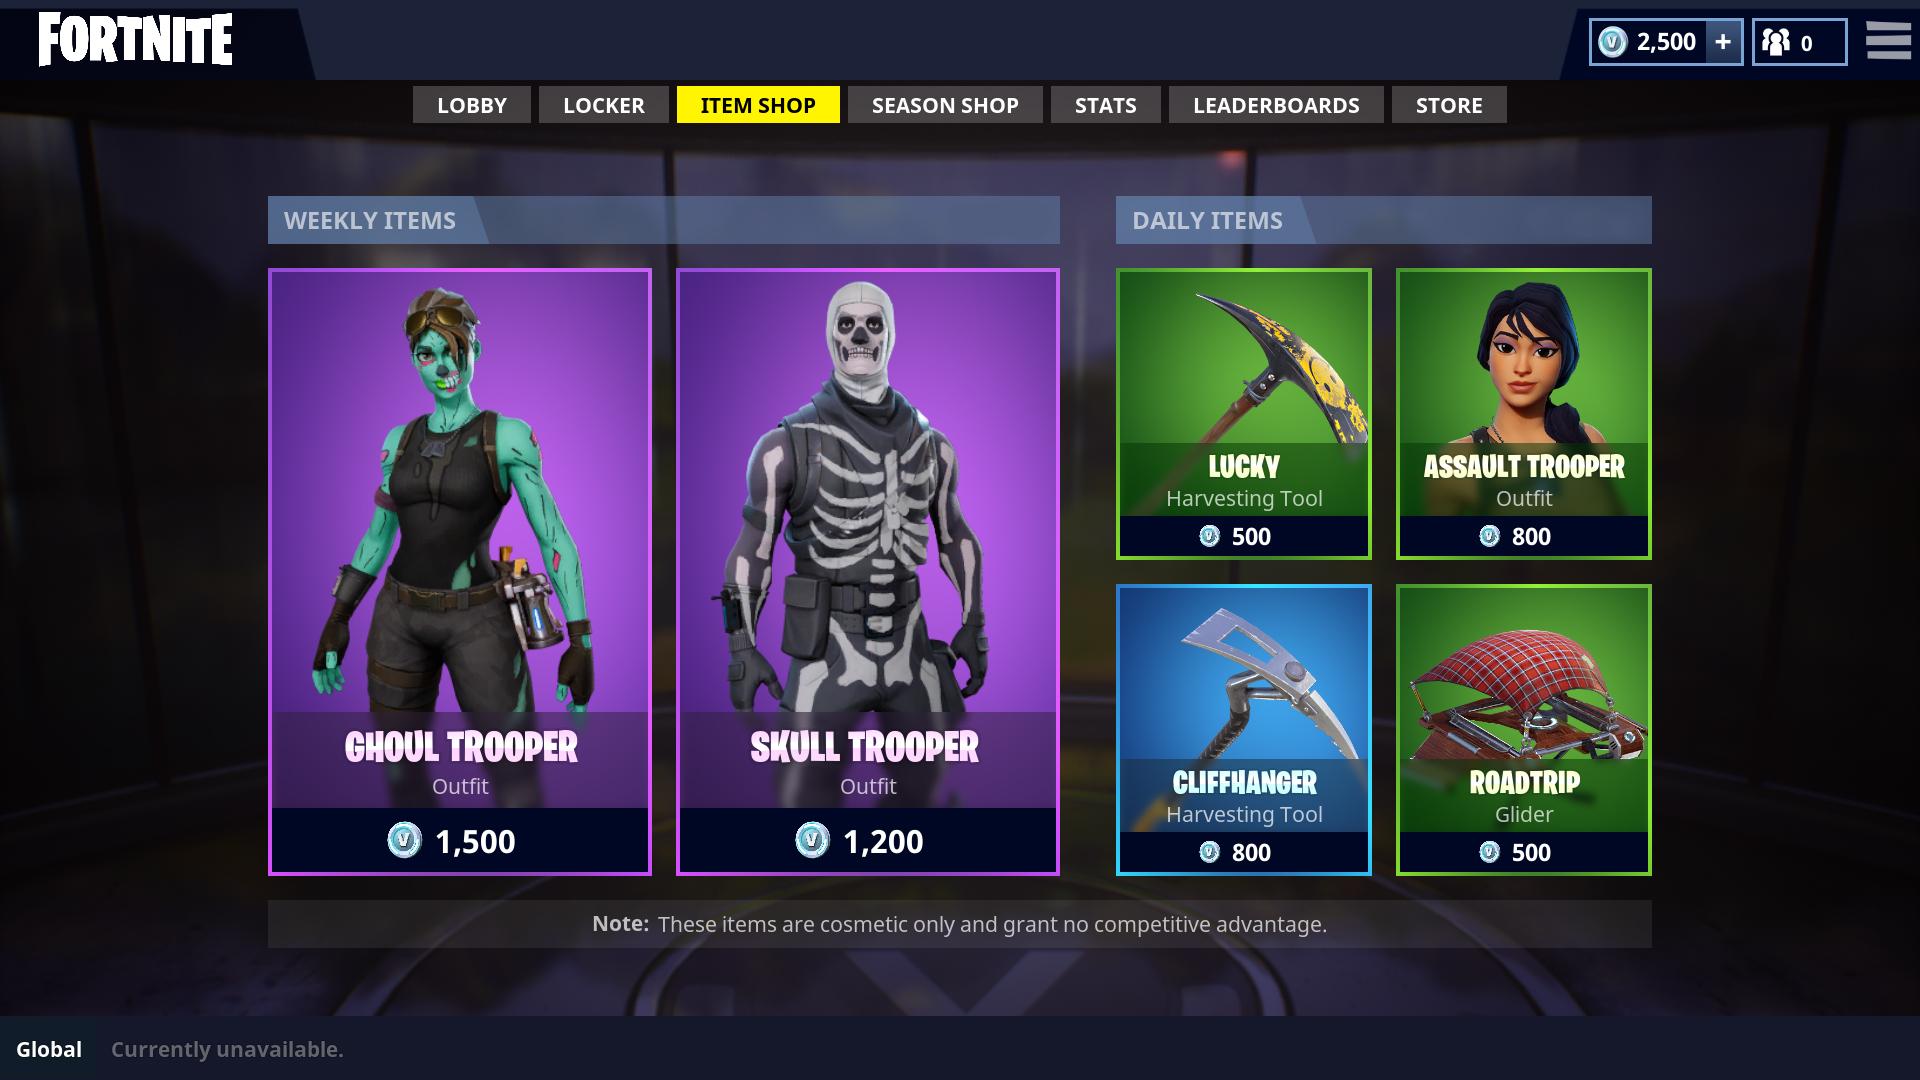 Fortnite live shop items